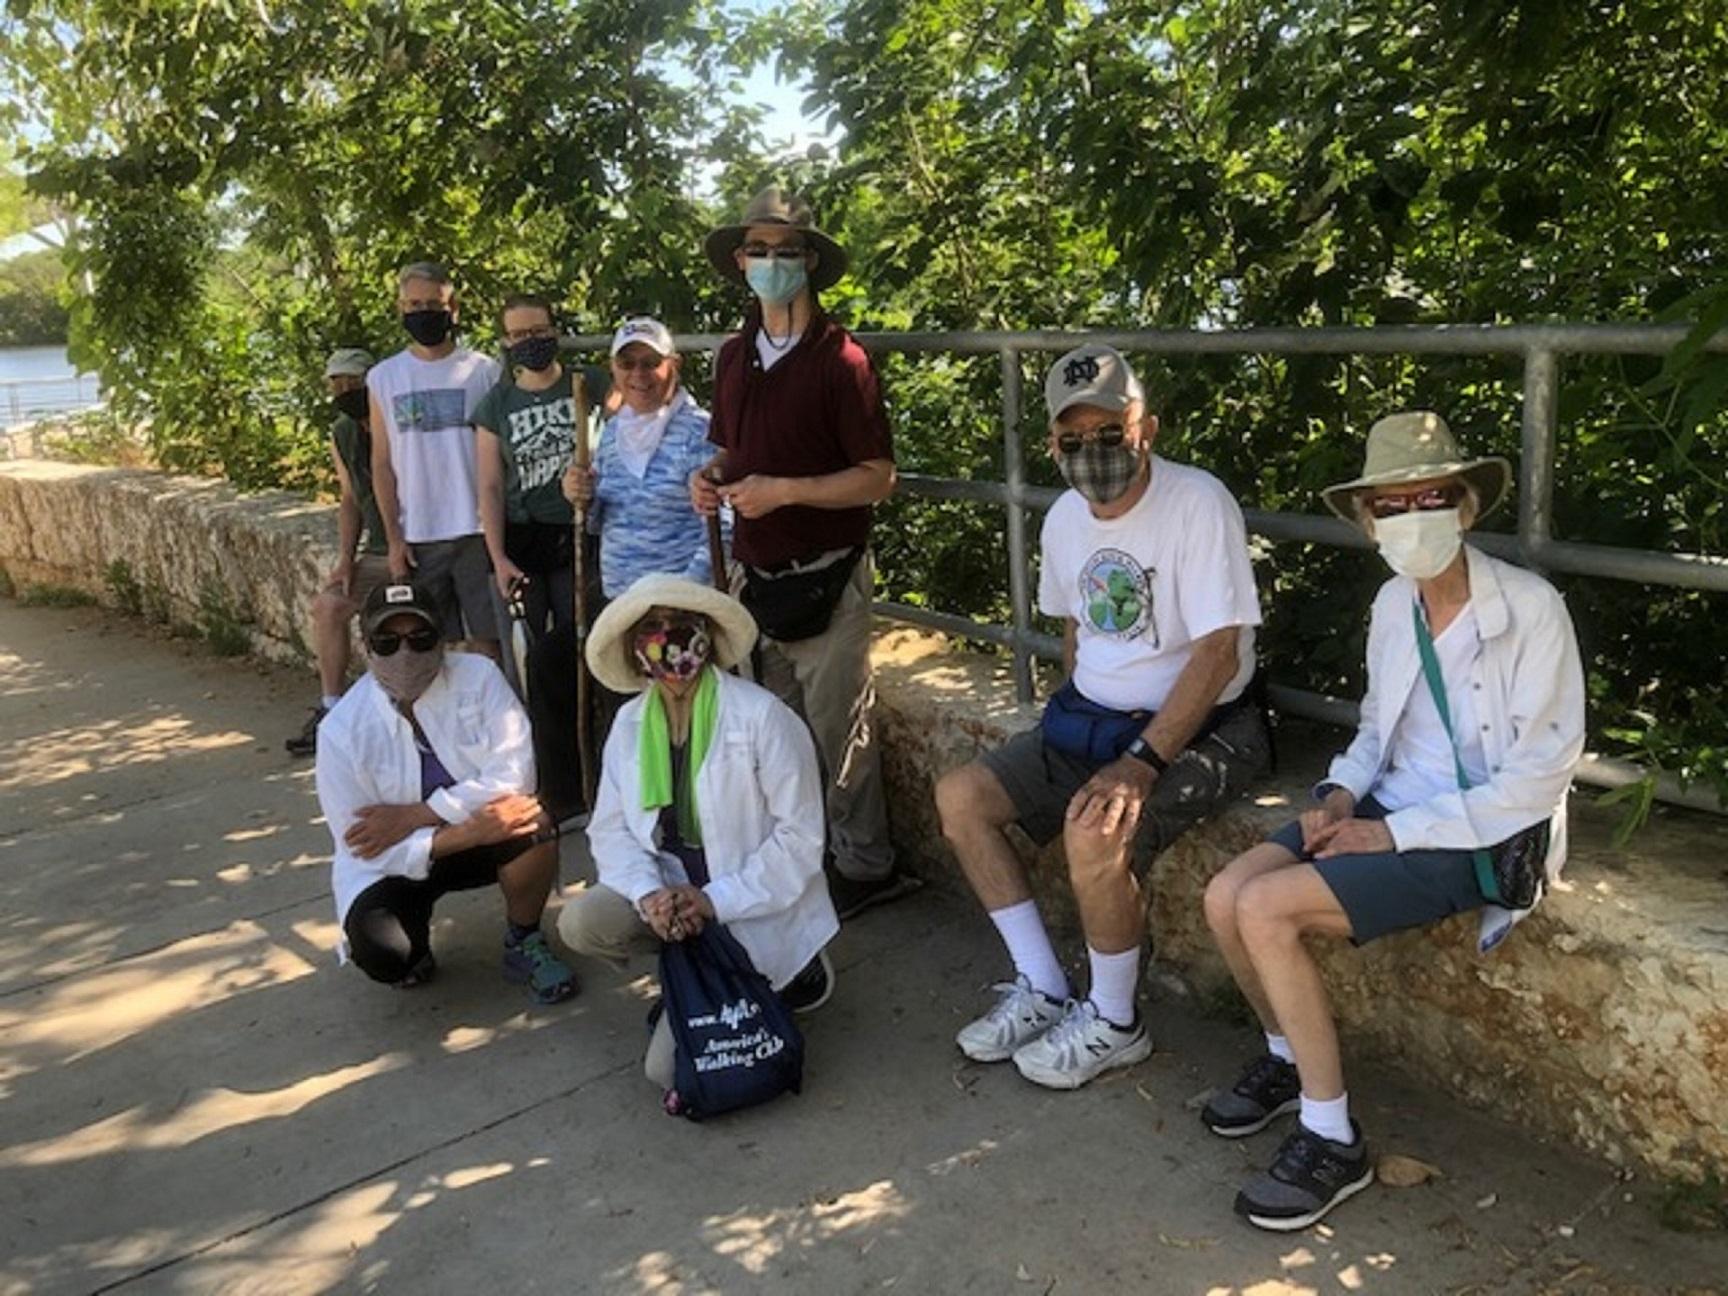 Lady Bird Lake YRE Group Walk in May